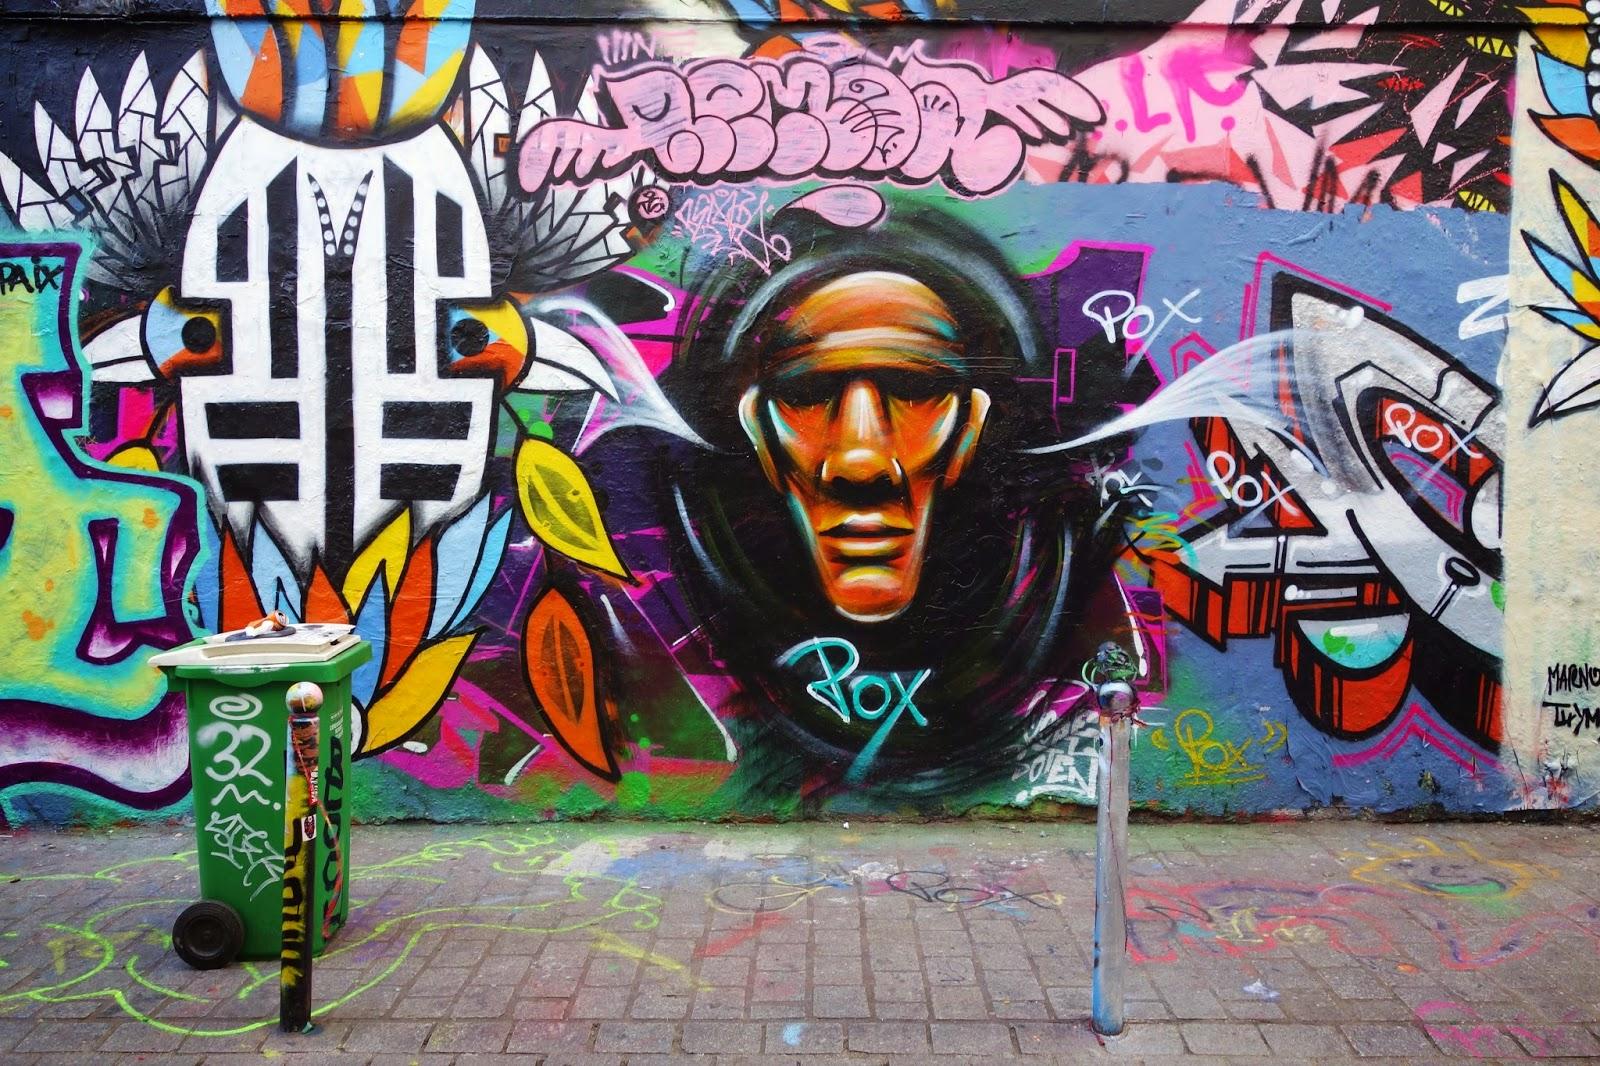 Sunday street art pox rue d noyez paris 20 paris la douce - Expo street art paris ...